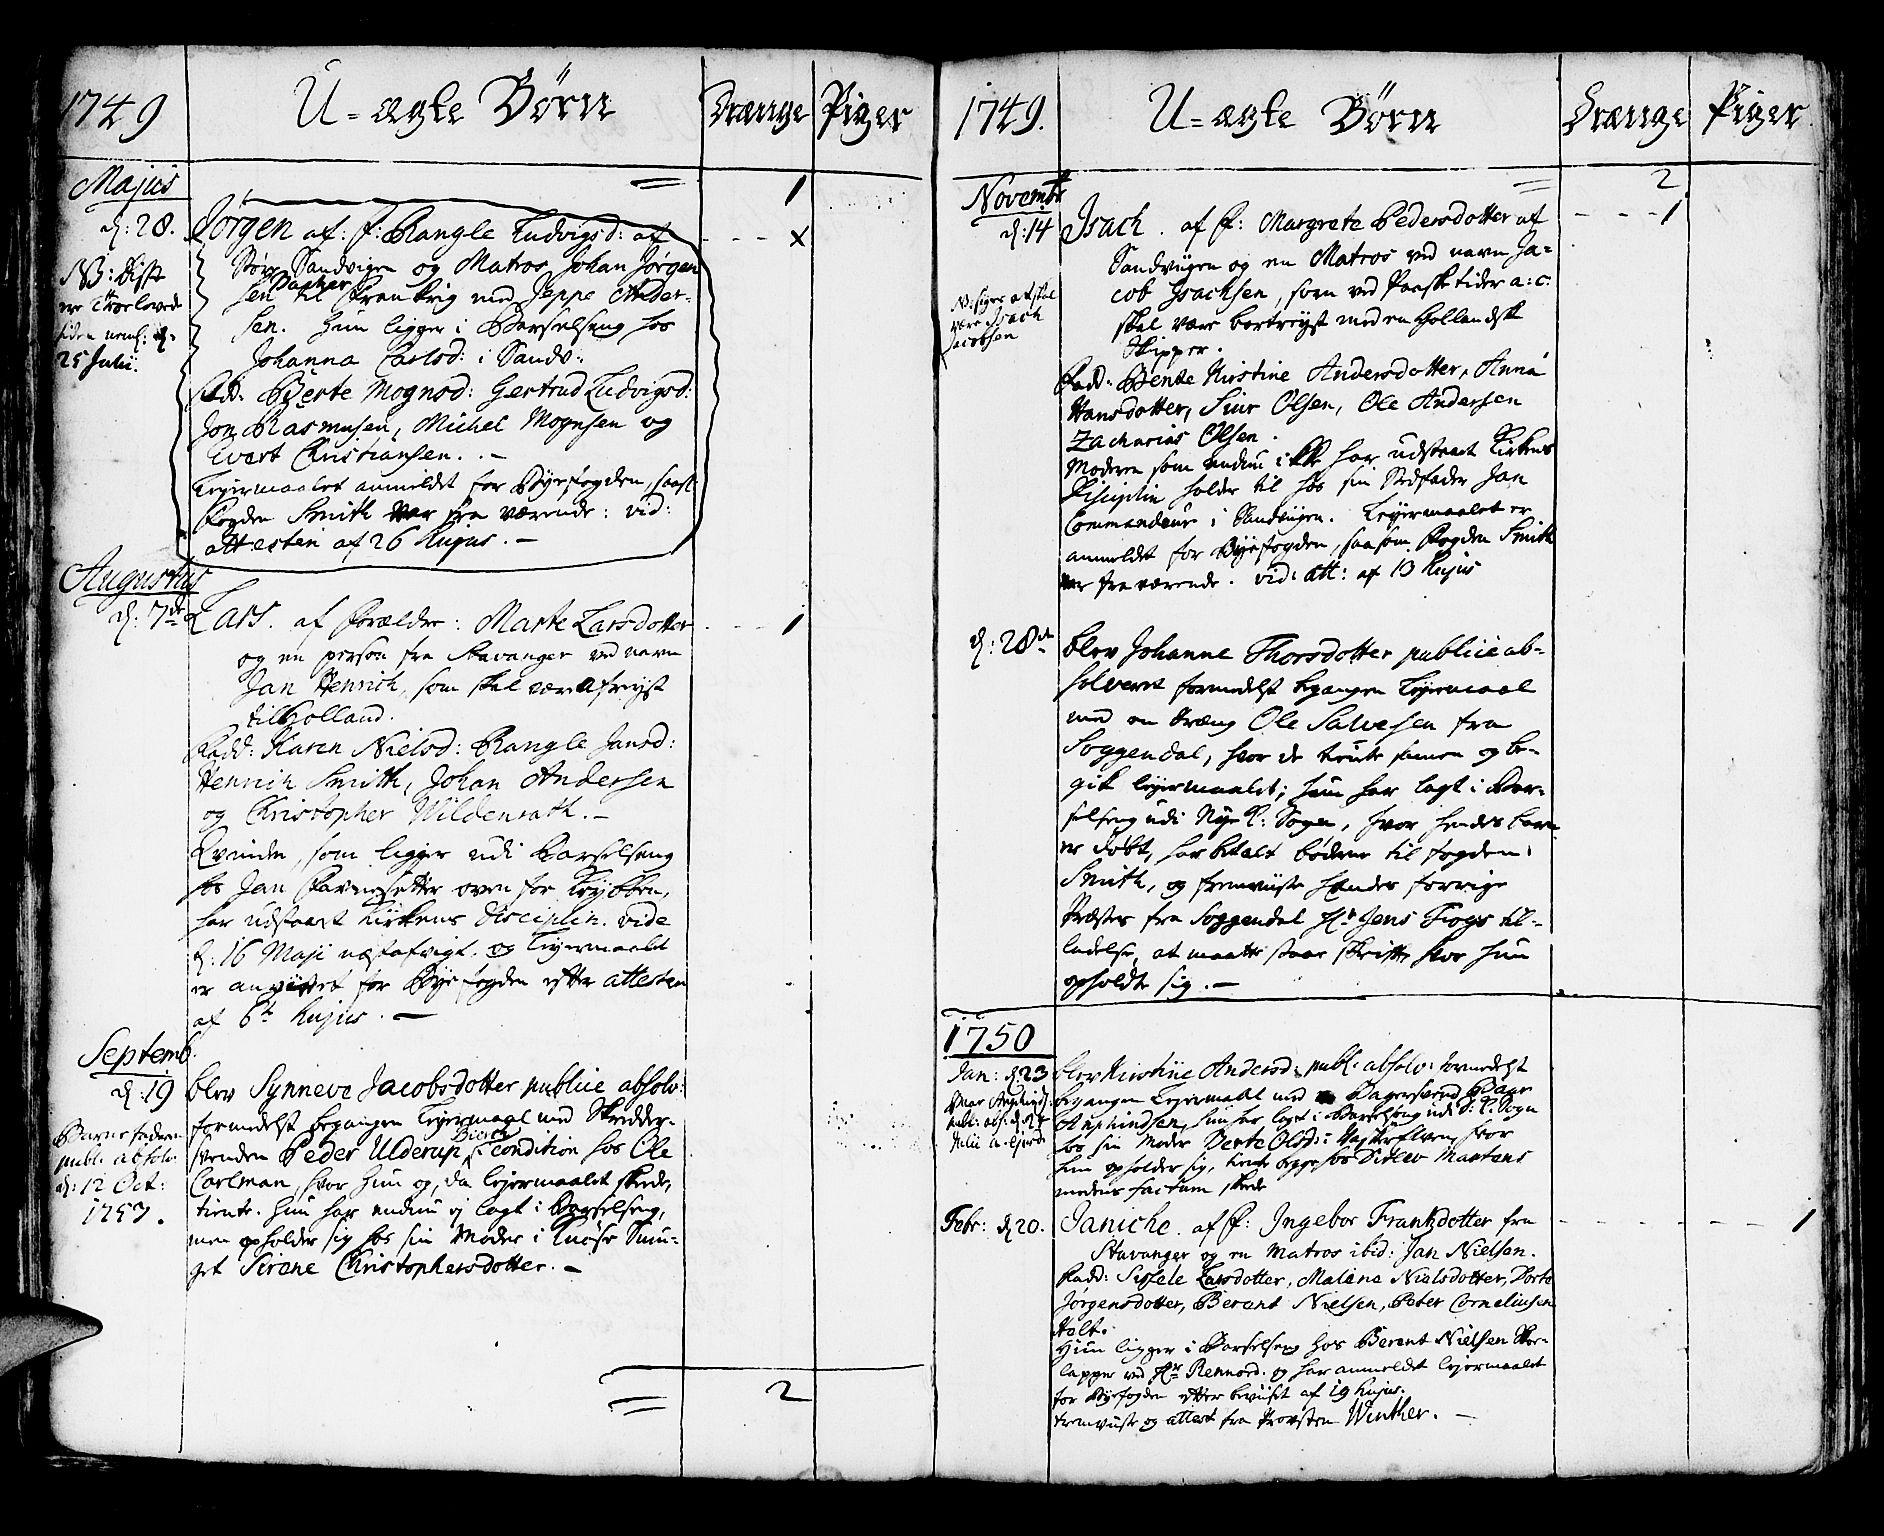 SAB, Korskirken Sokneprestembete, H/Haa/L0004: Ministerialbok nr. A 4, 1720-1750, s. 301